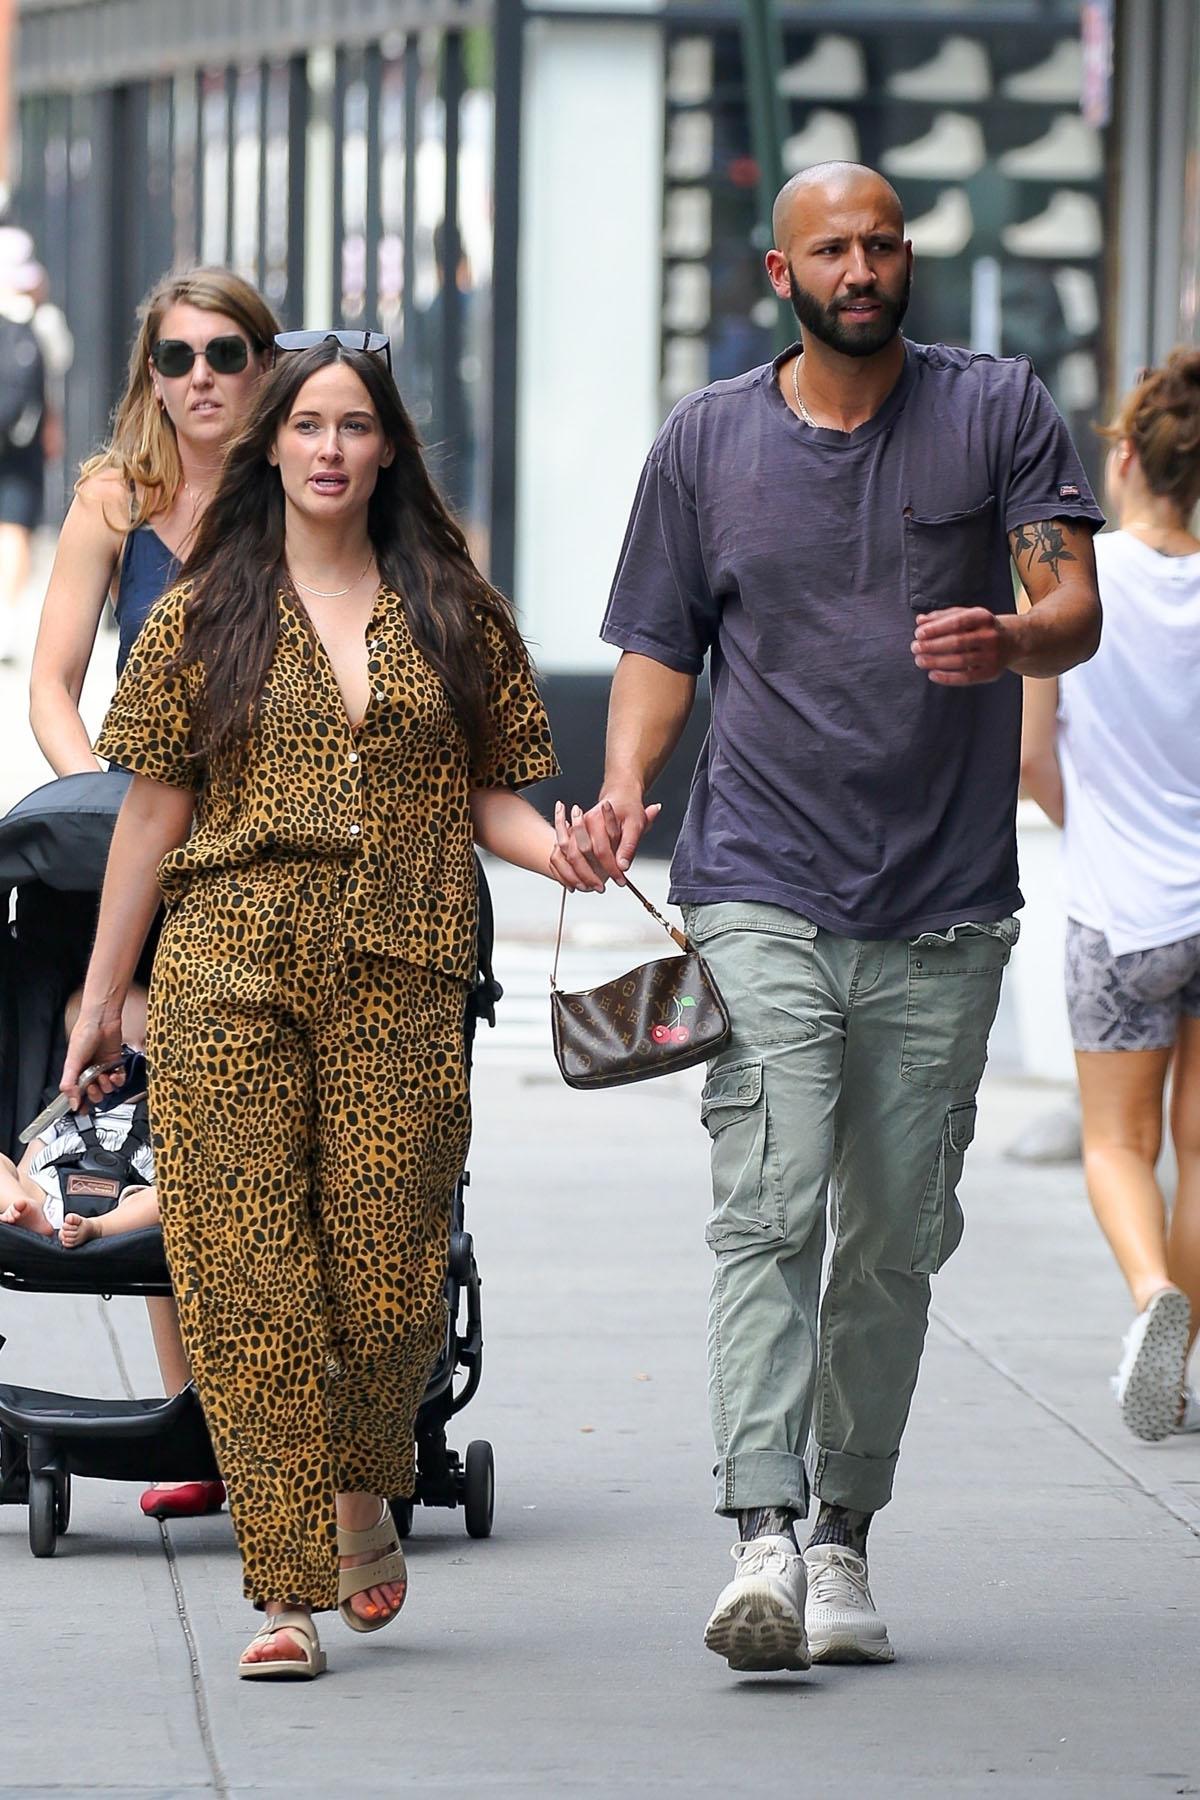 Kacey Musgraves and boyfriend Cole Schafer walk Hand in Hand  in New York